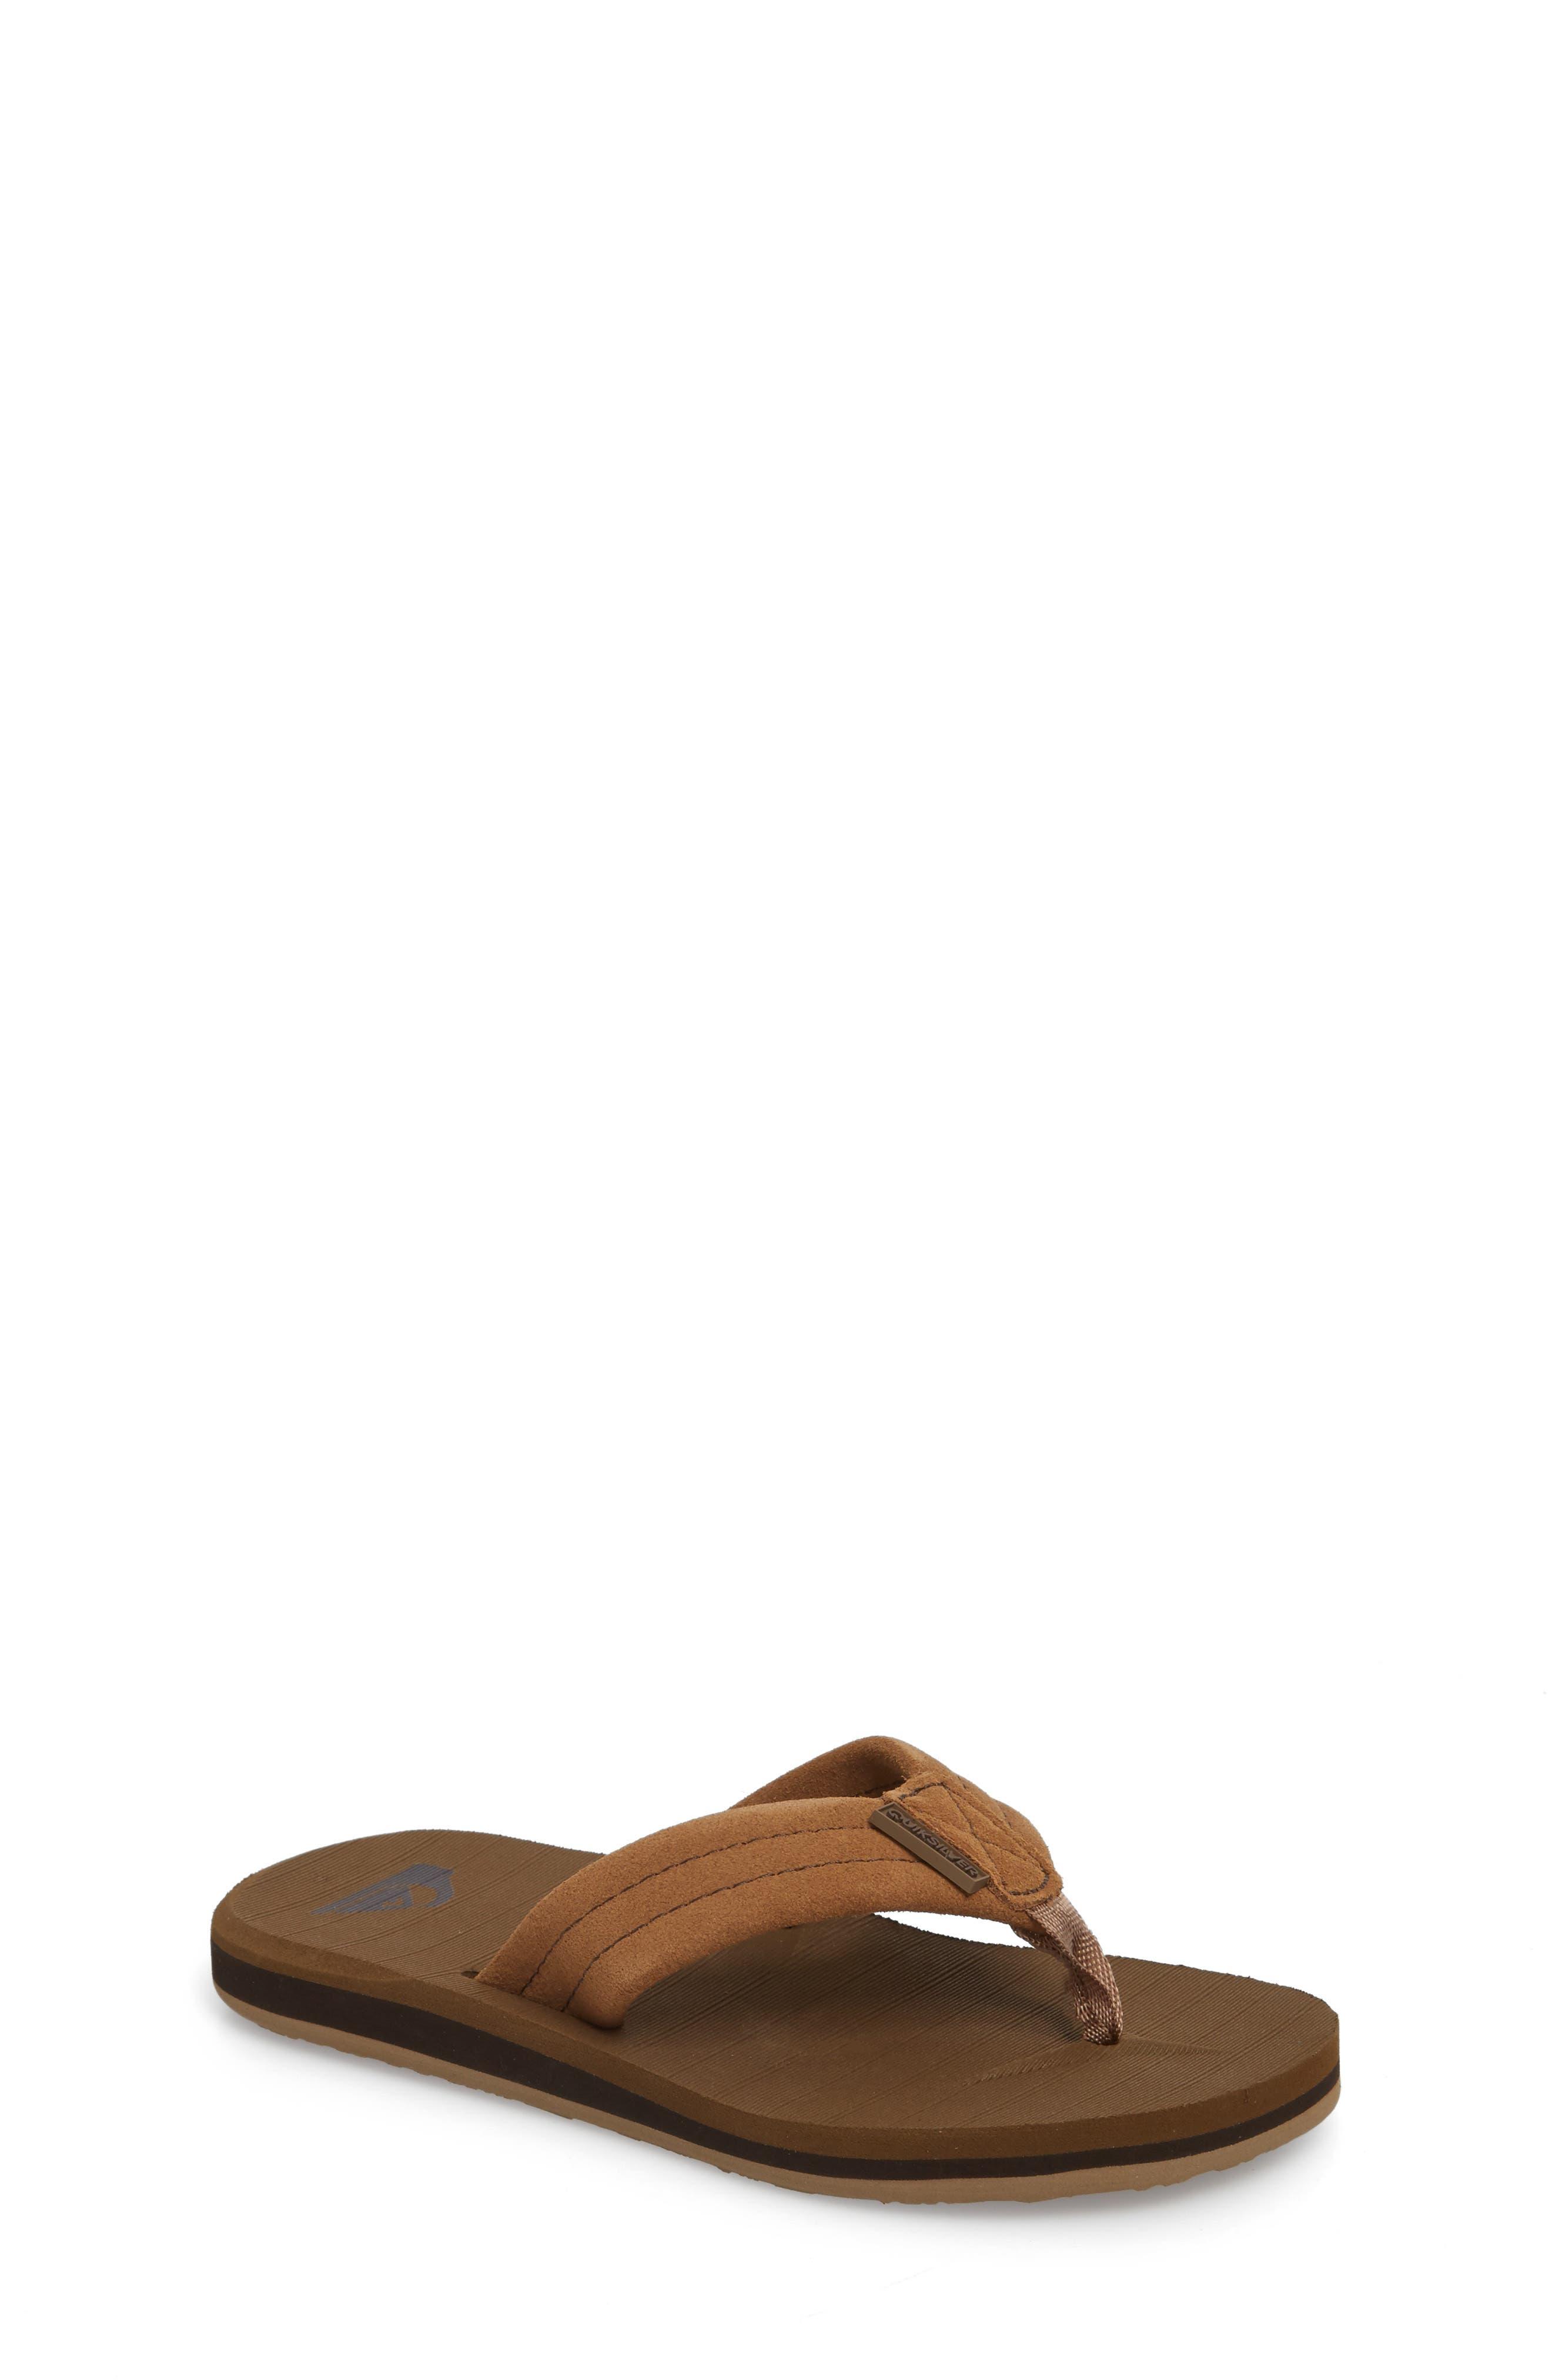 Toddler Boys Quiksilver Carver Flip Flop Size 12 M  Brown